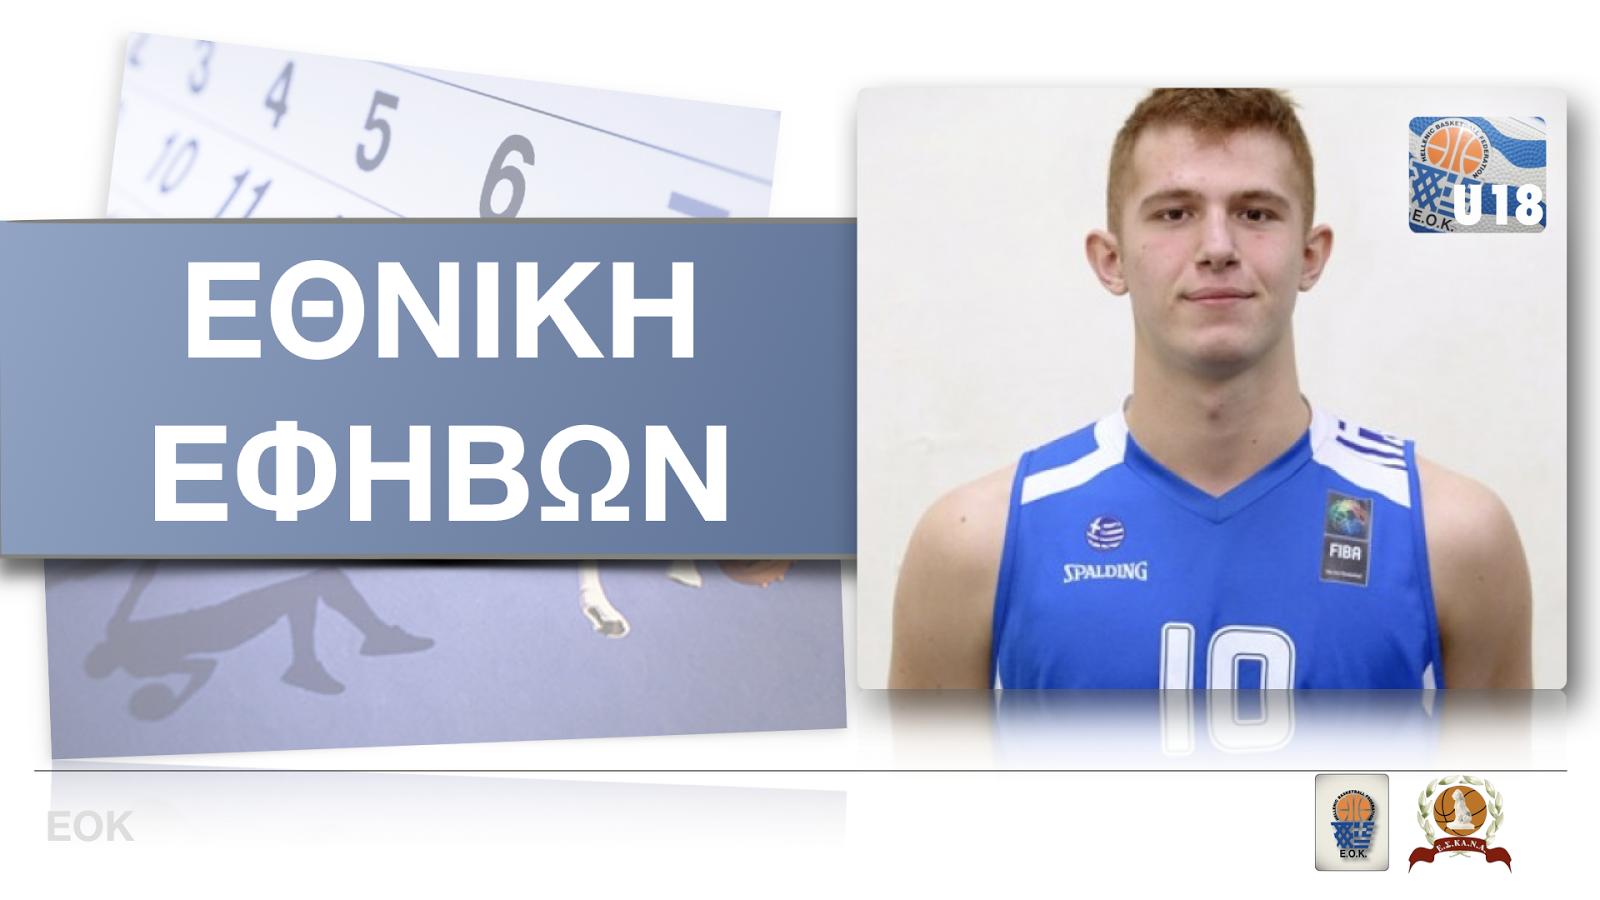 EOK | Εθνική Εφήβων, Δ. Χατζηκυριακίδης: «Στο χέρι μας πώς θα χειριστούμε το κάθε παιχνίδι»